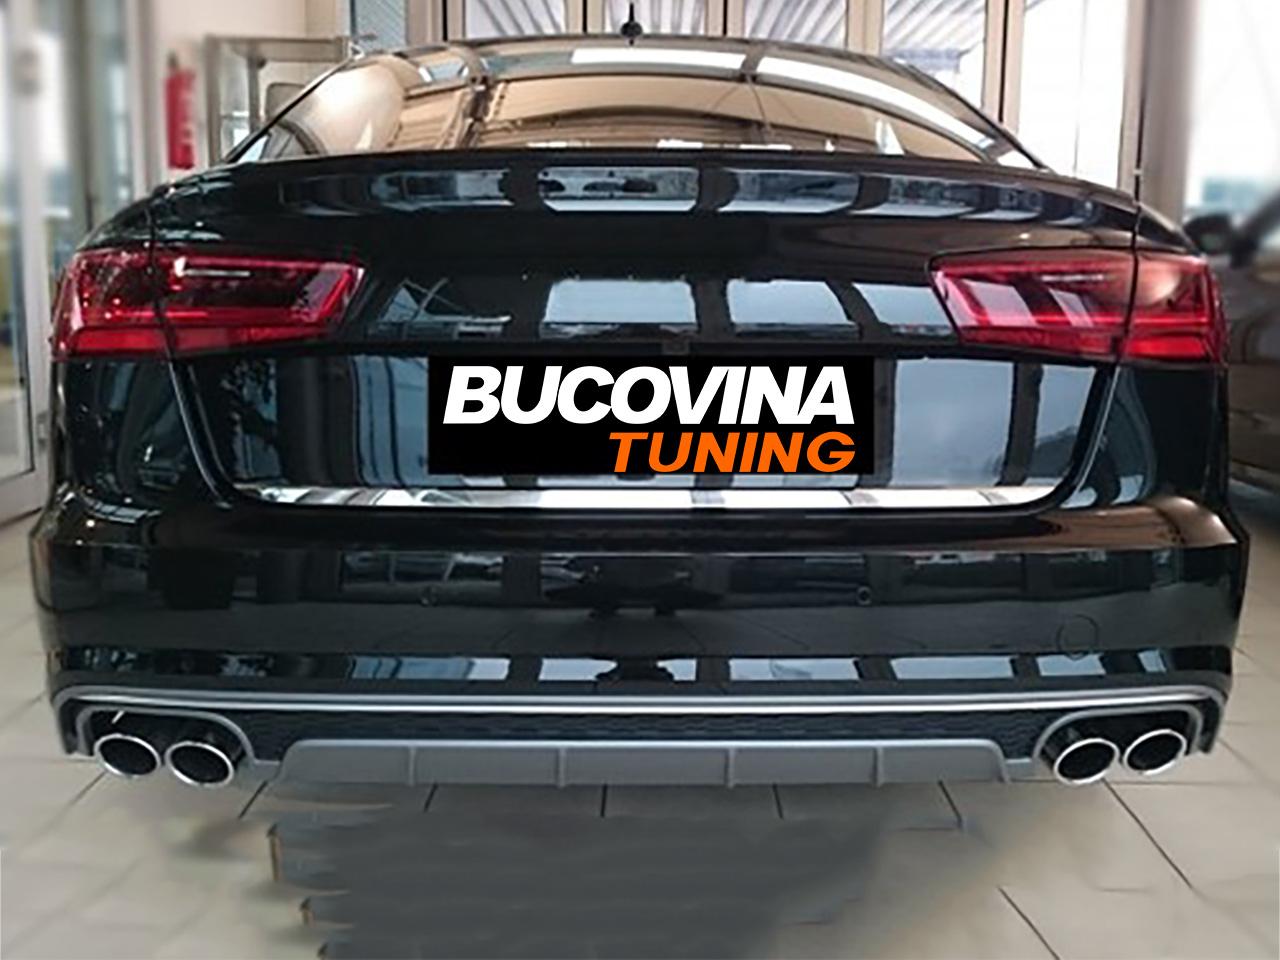 Difuzor Bara Spate Audi A6 4g C7 Facelift 15 18 S6 Design Bucovina Tuning